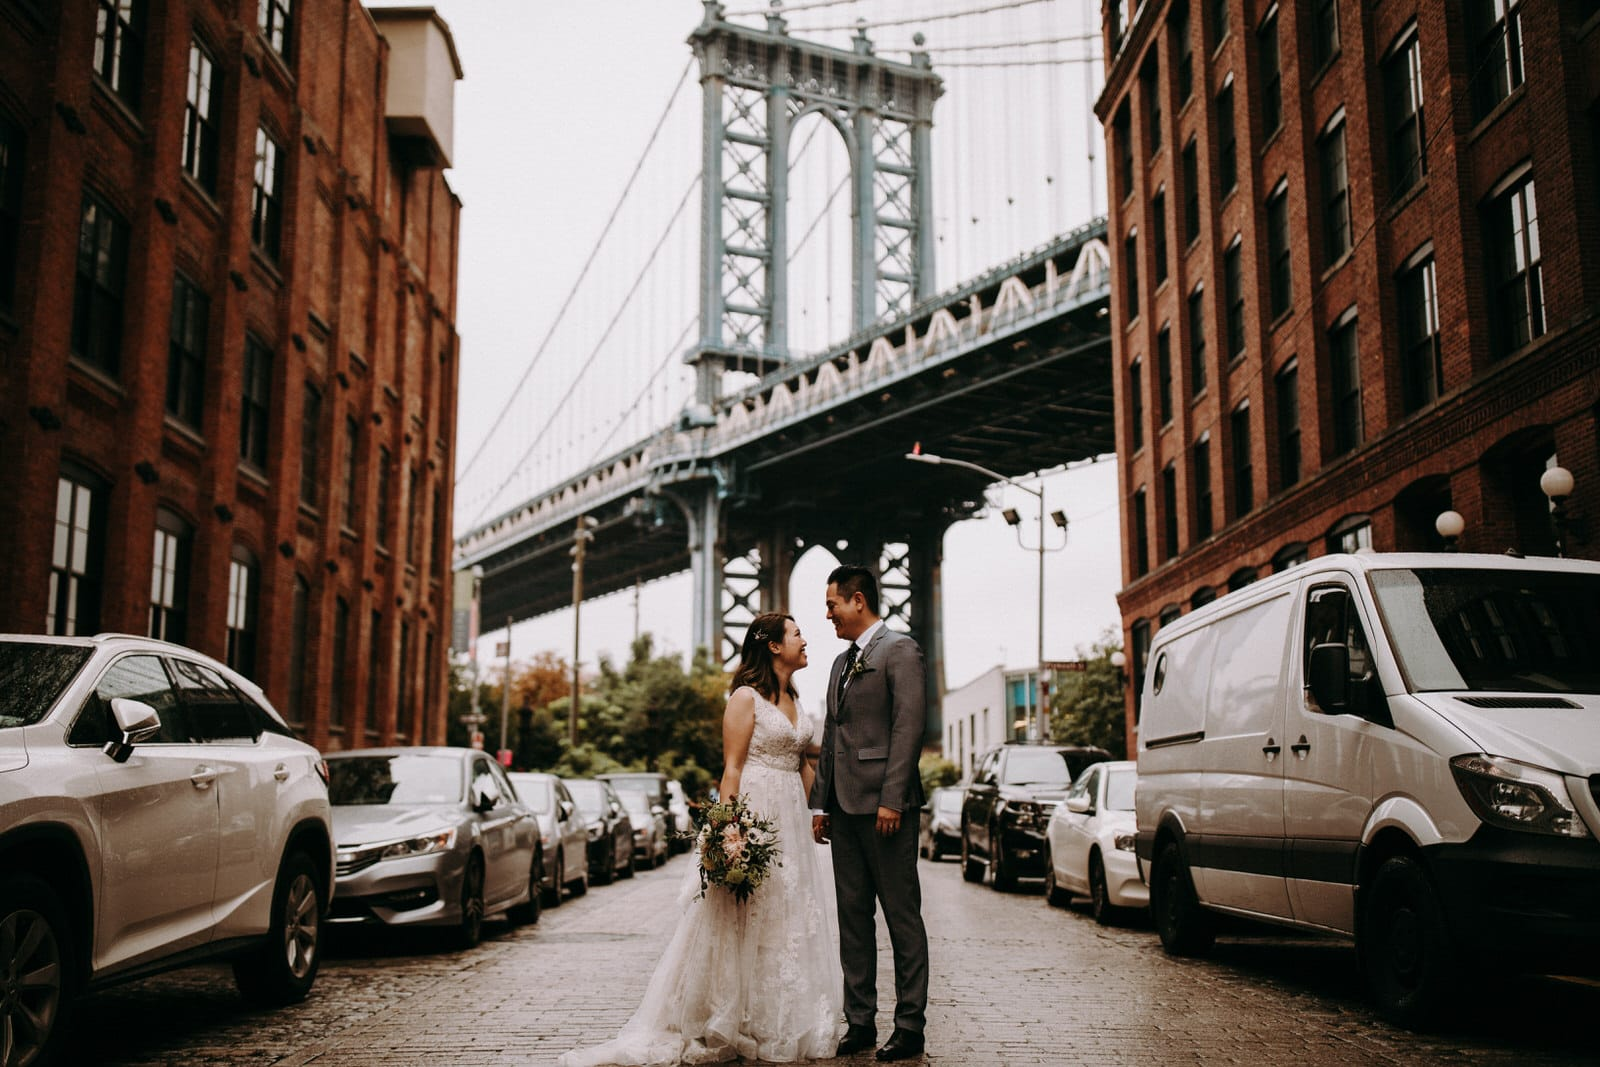 The wedding couple is standing under the Brooklyn Bridge.